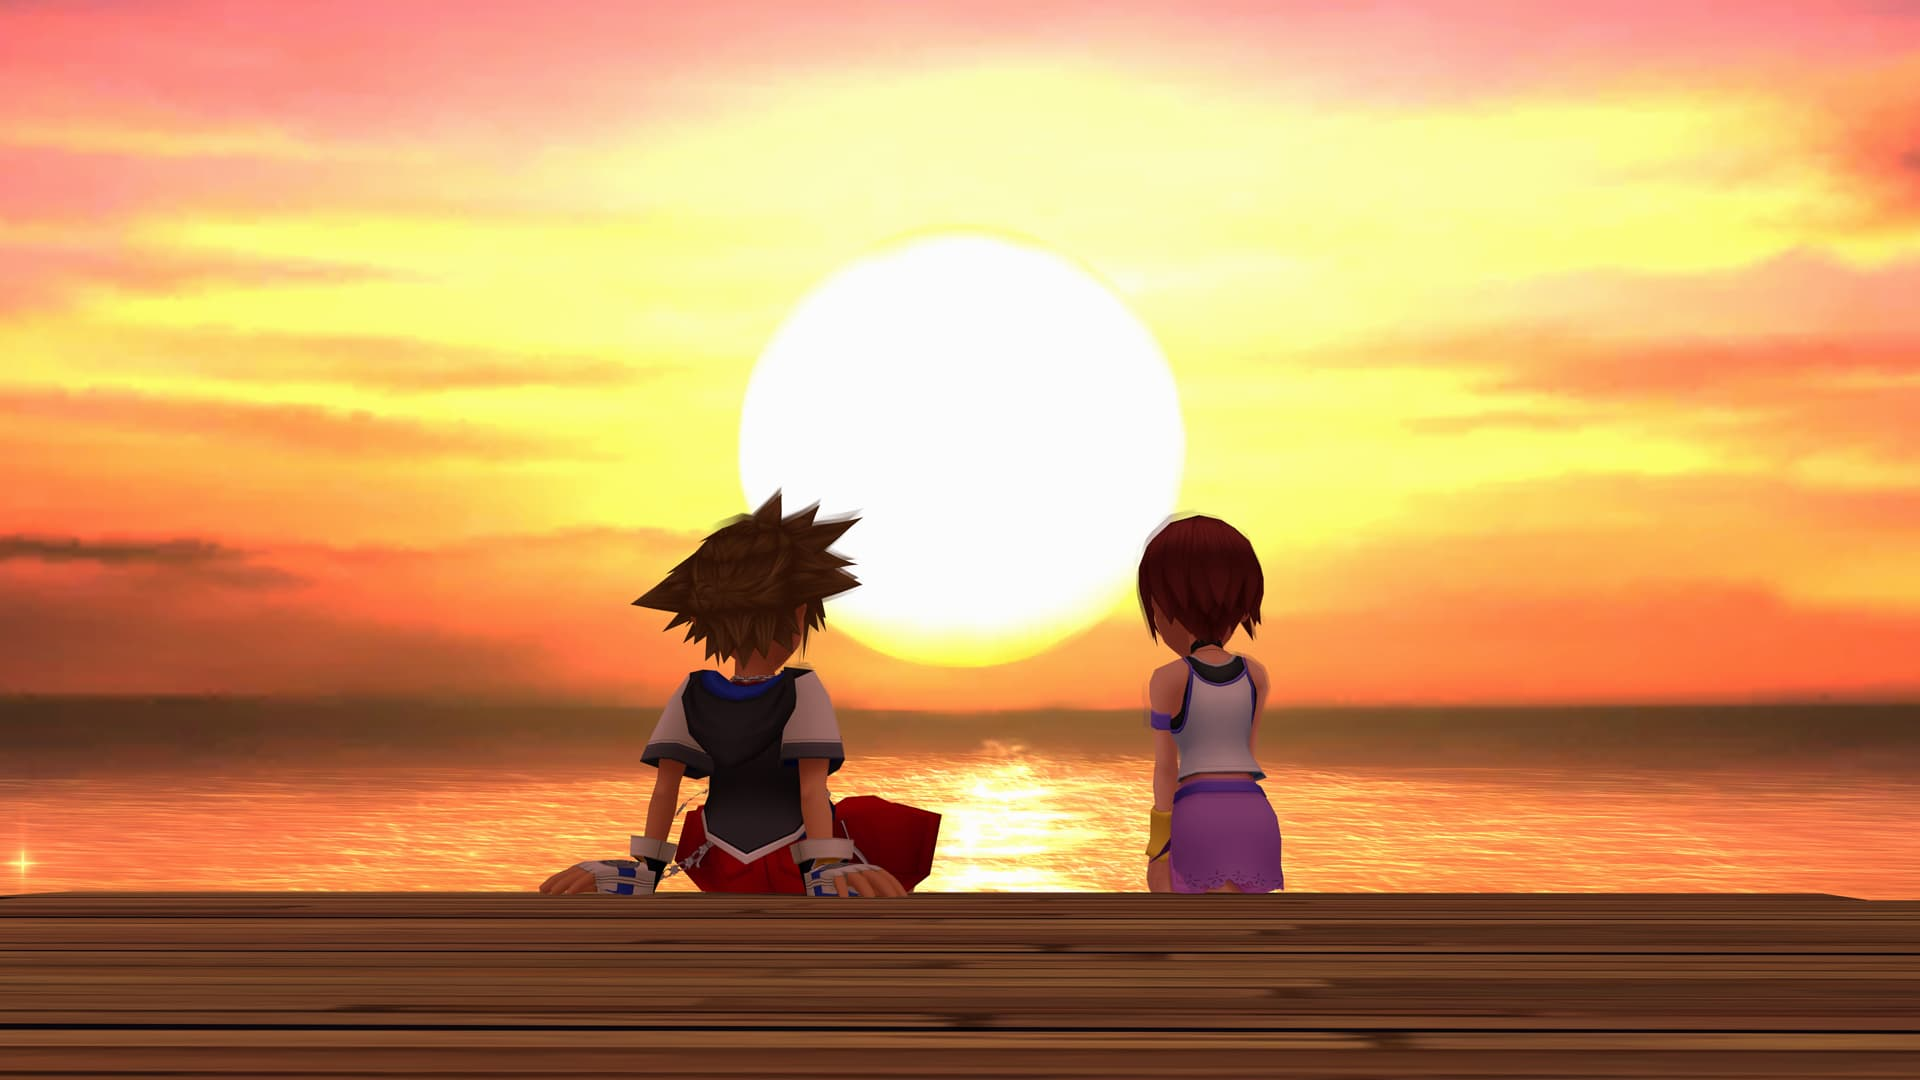 Ya disponible toda la saga Kingdom Hearts en Xbox Game Pass 2